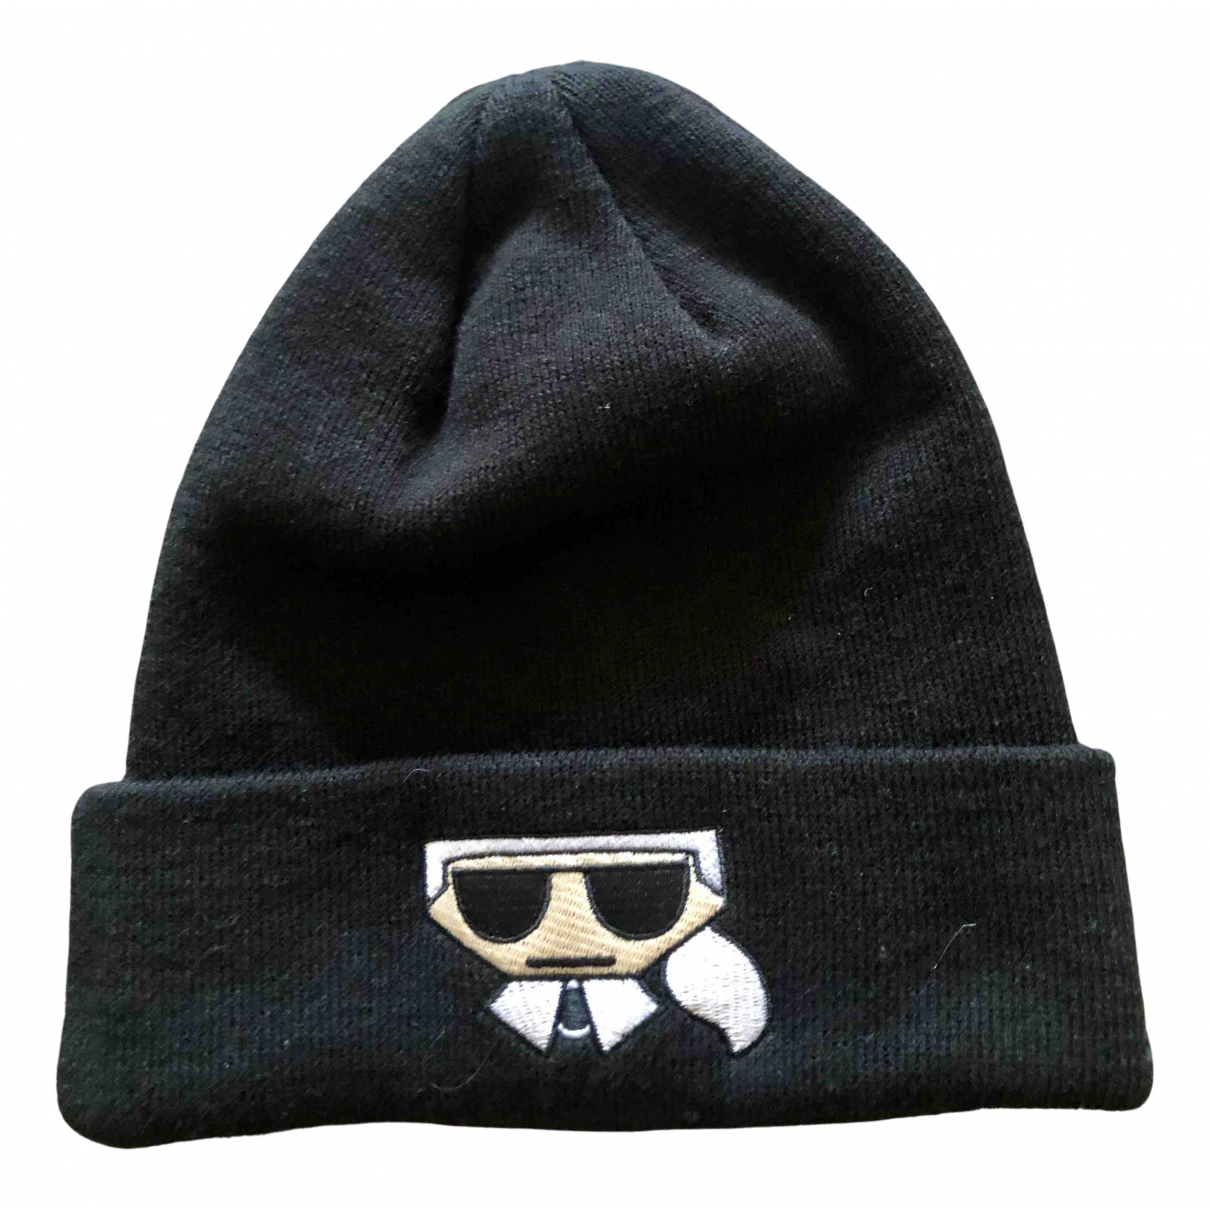 Karl Lagerfeld N Black Wool hat for Women S International